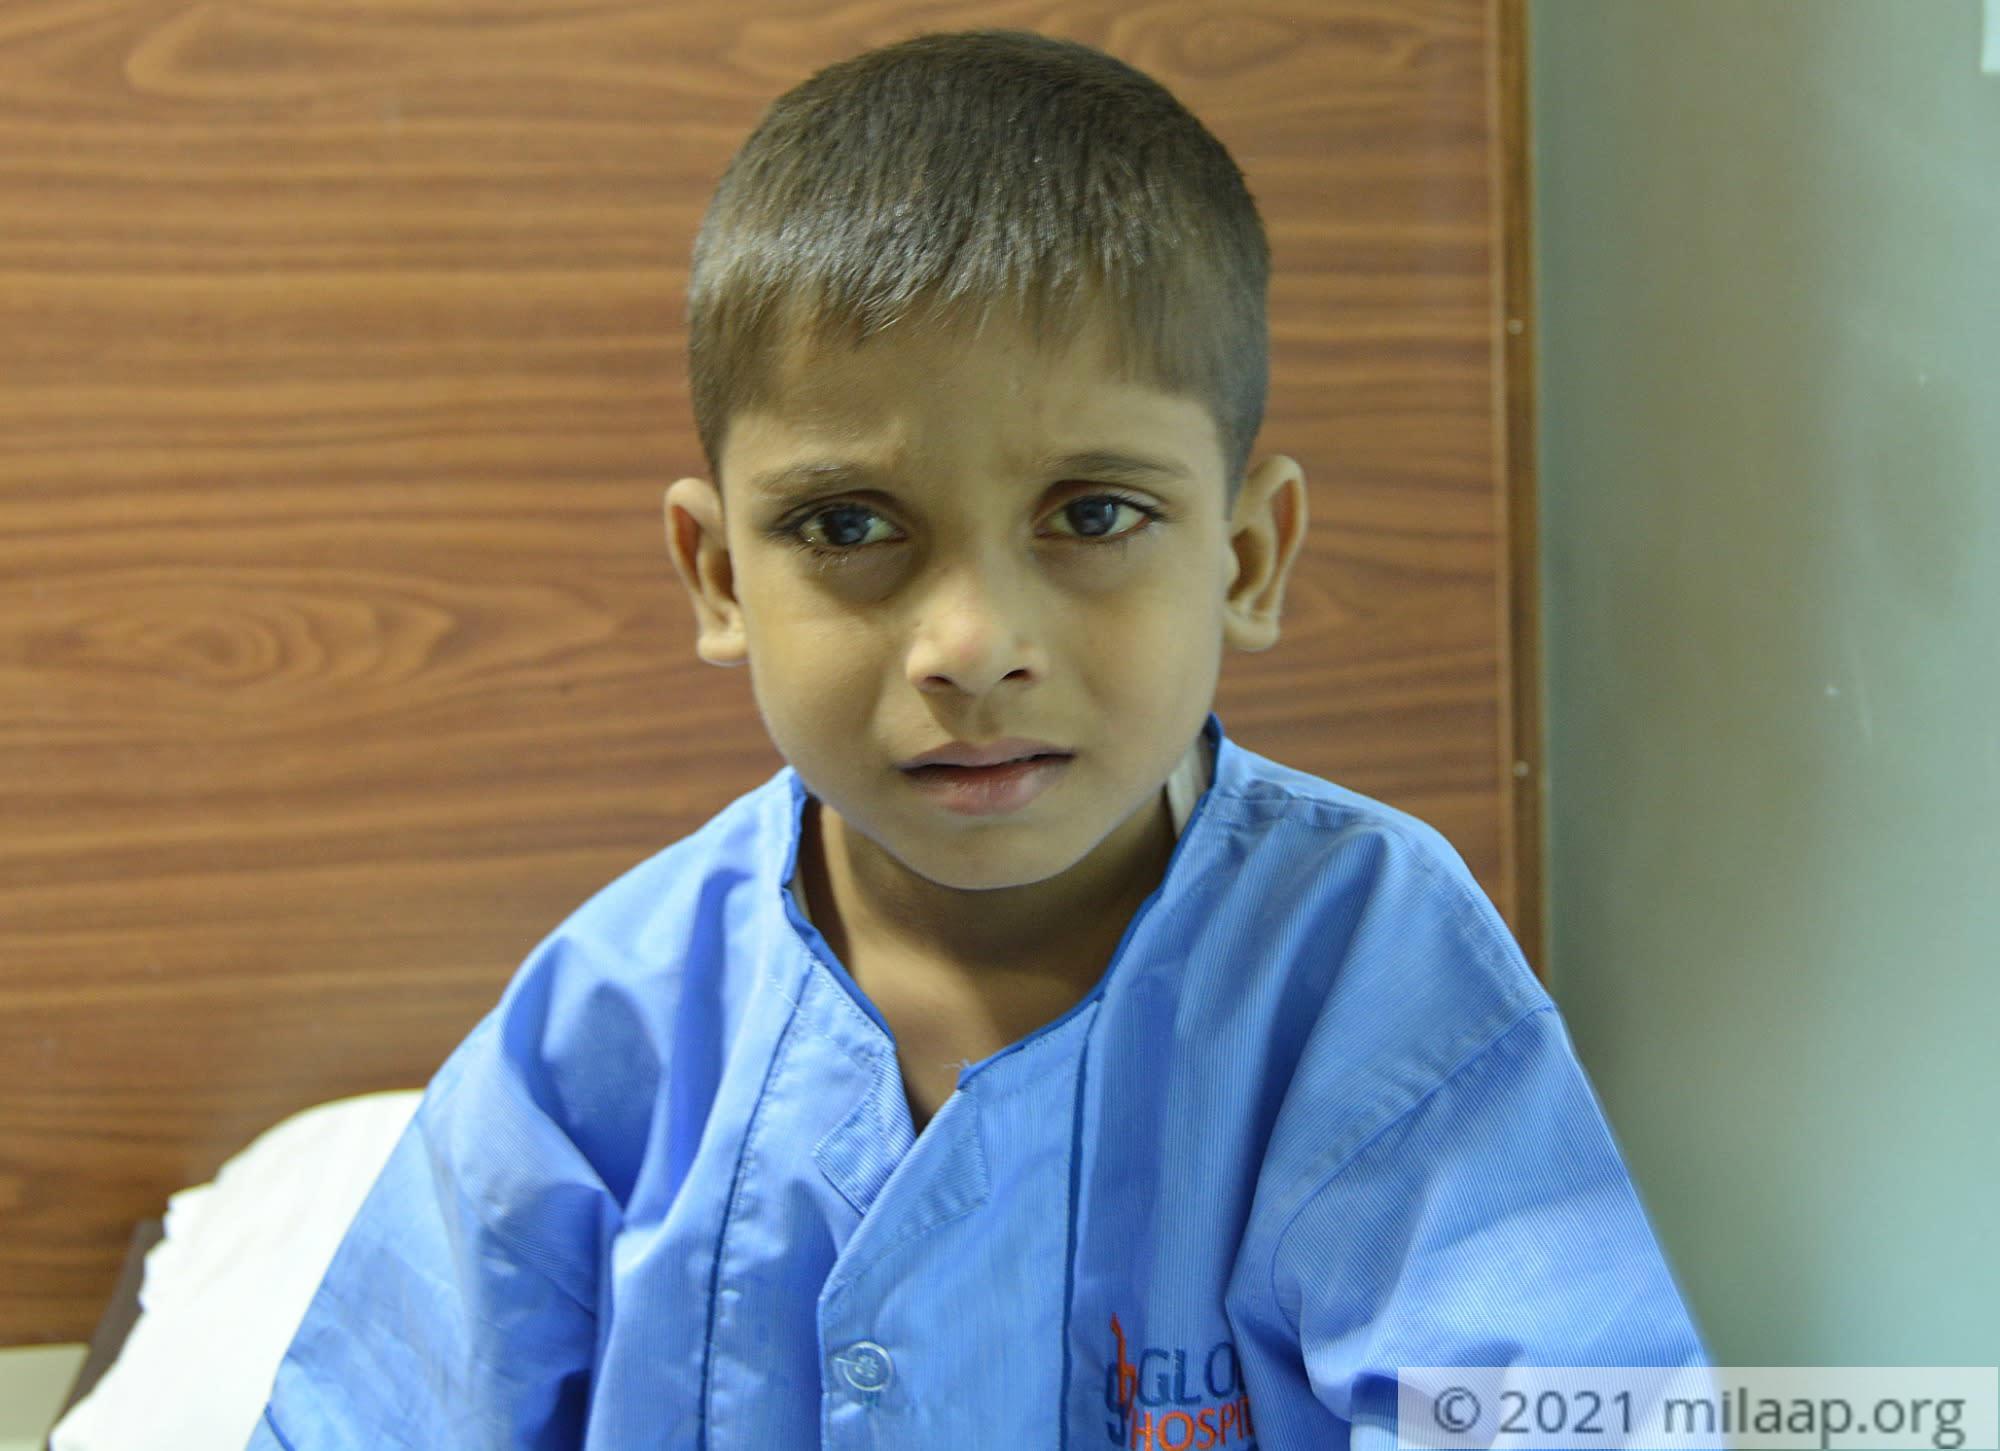 Hammad global hospital 03 pqixyp 1571245034